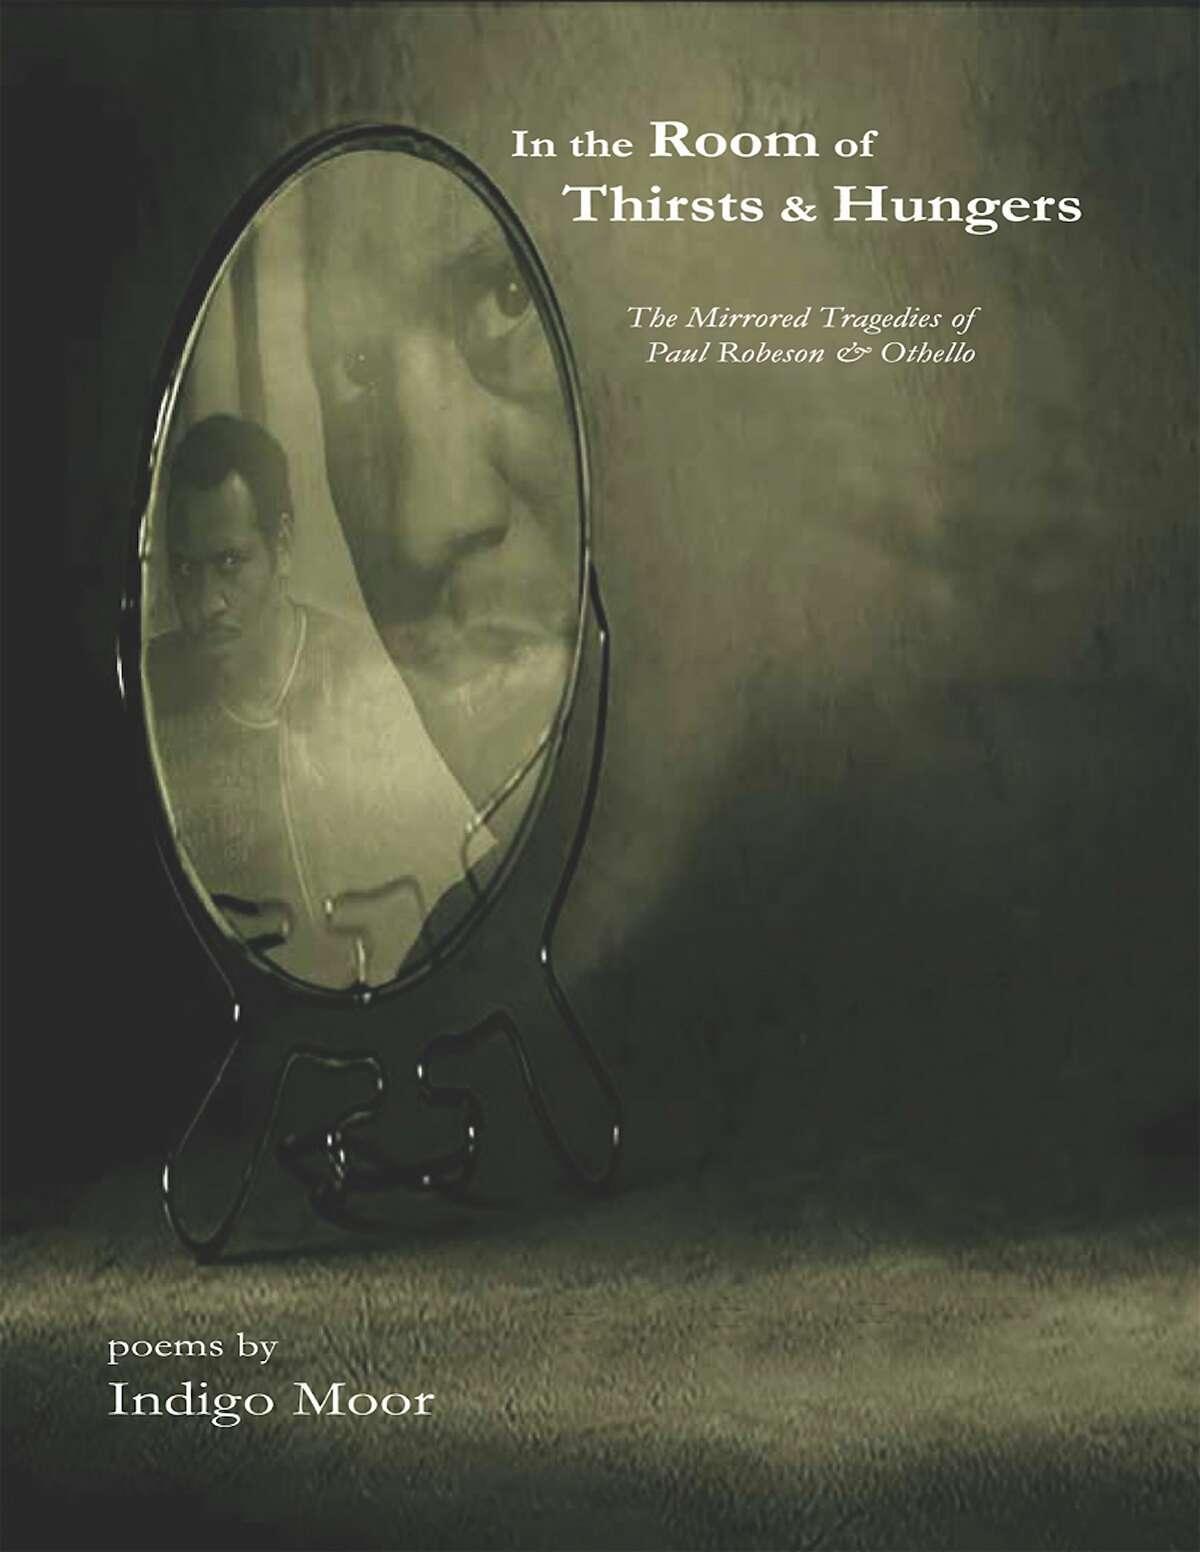 Indigo Moor's new book of poems,